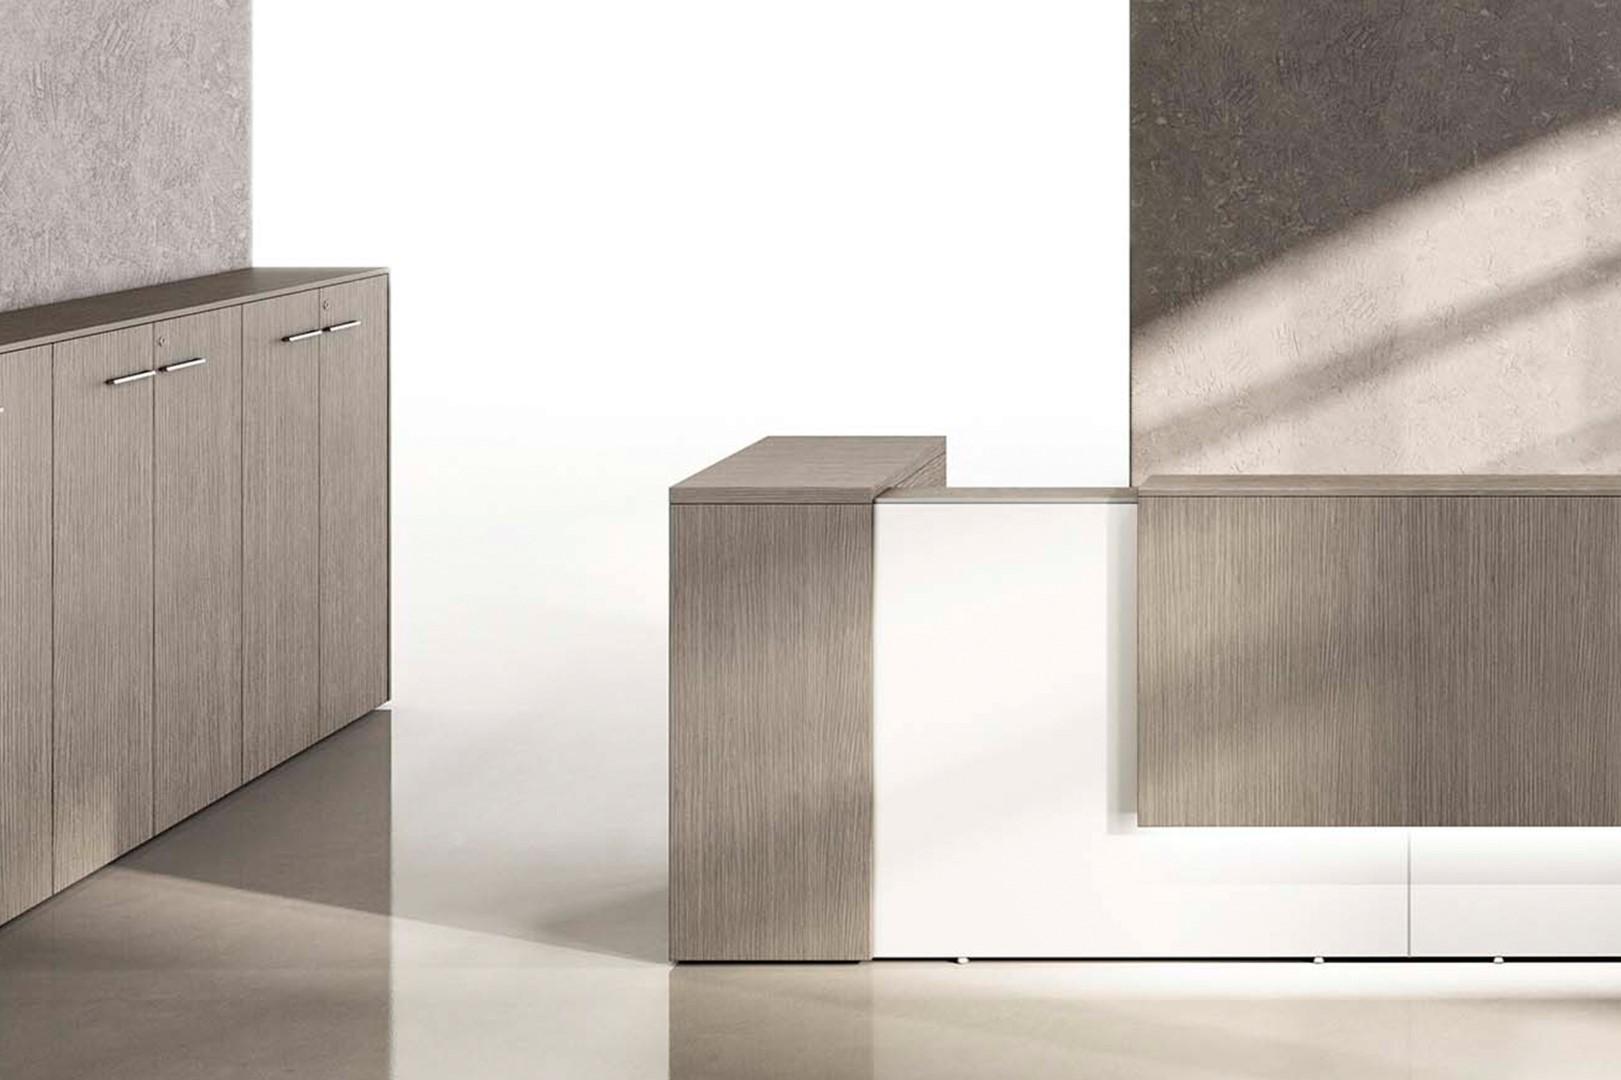 furniture_0017_4.reception desk_office furniture (3)